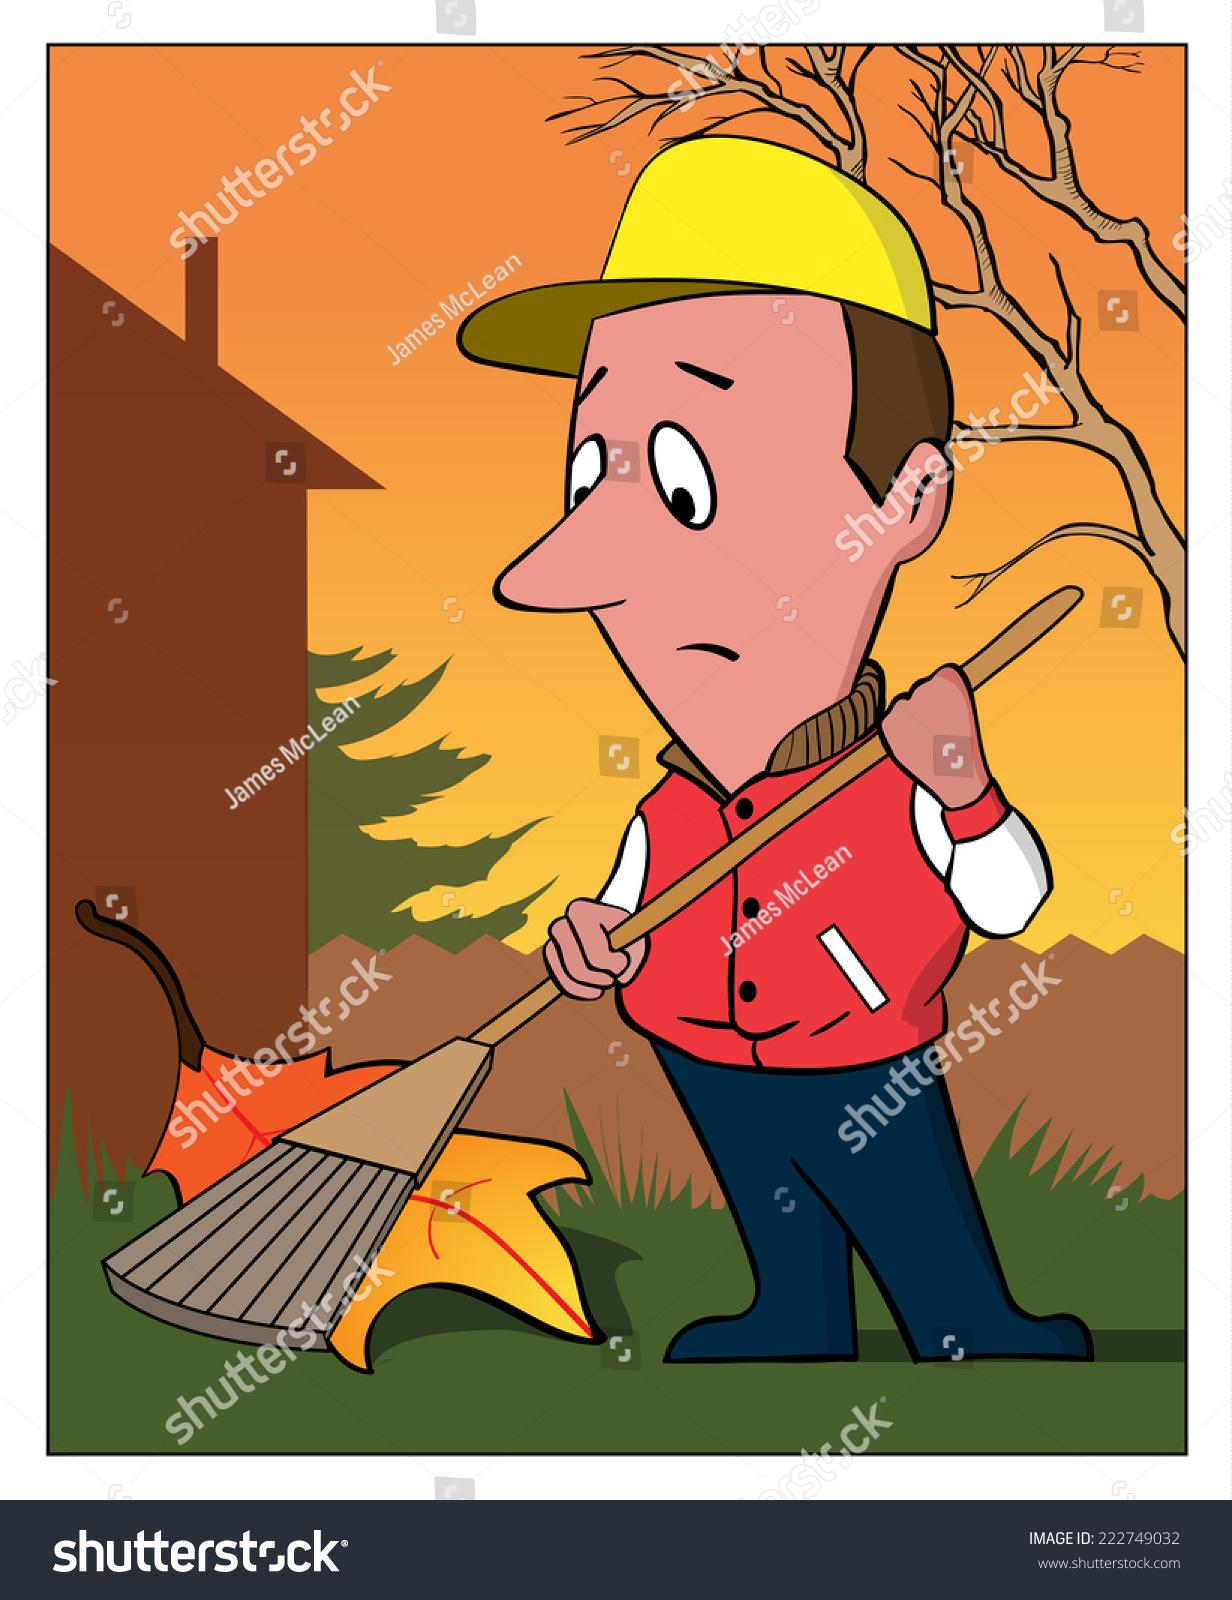 hight resolution of raking leaf a man rakes a very large leaf